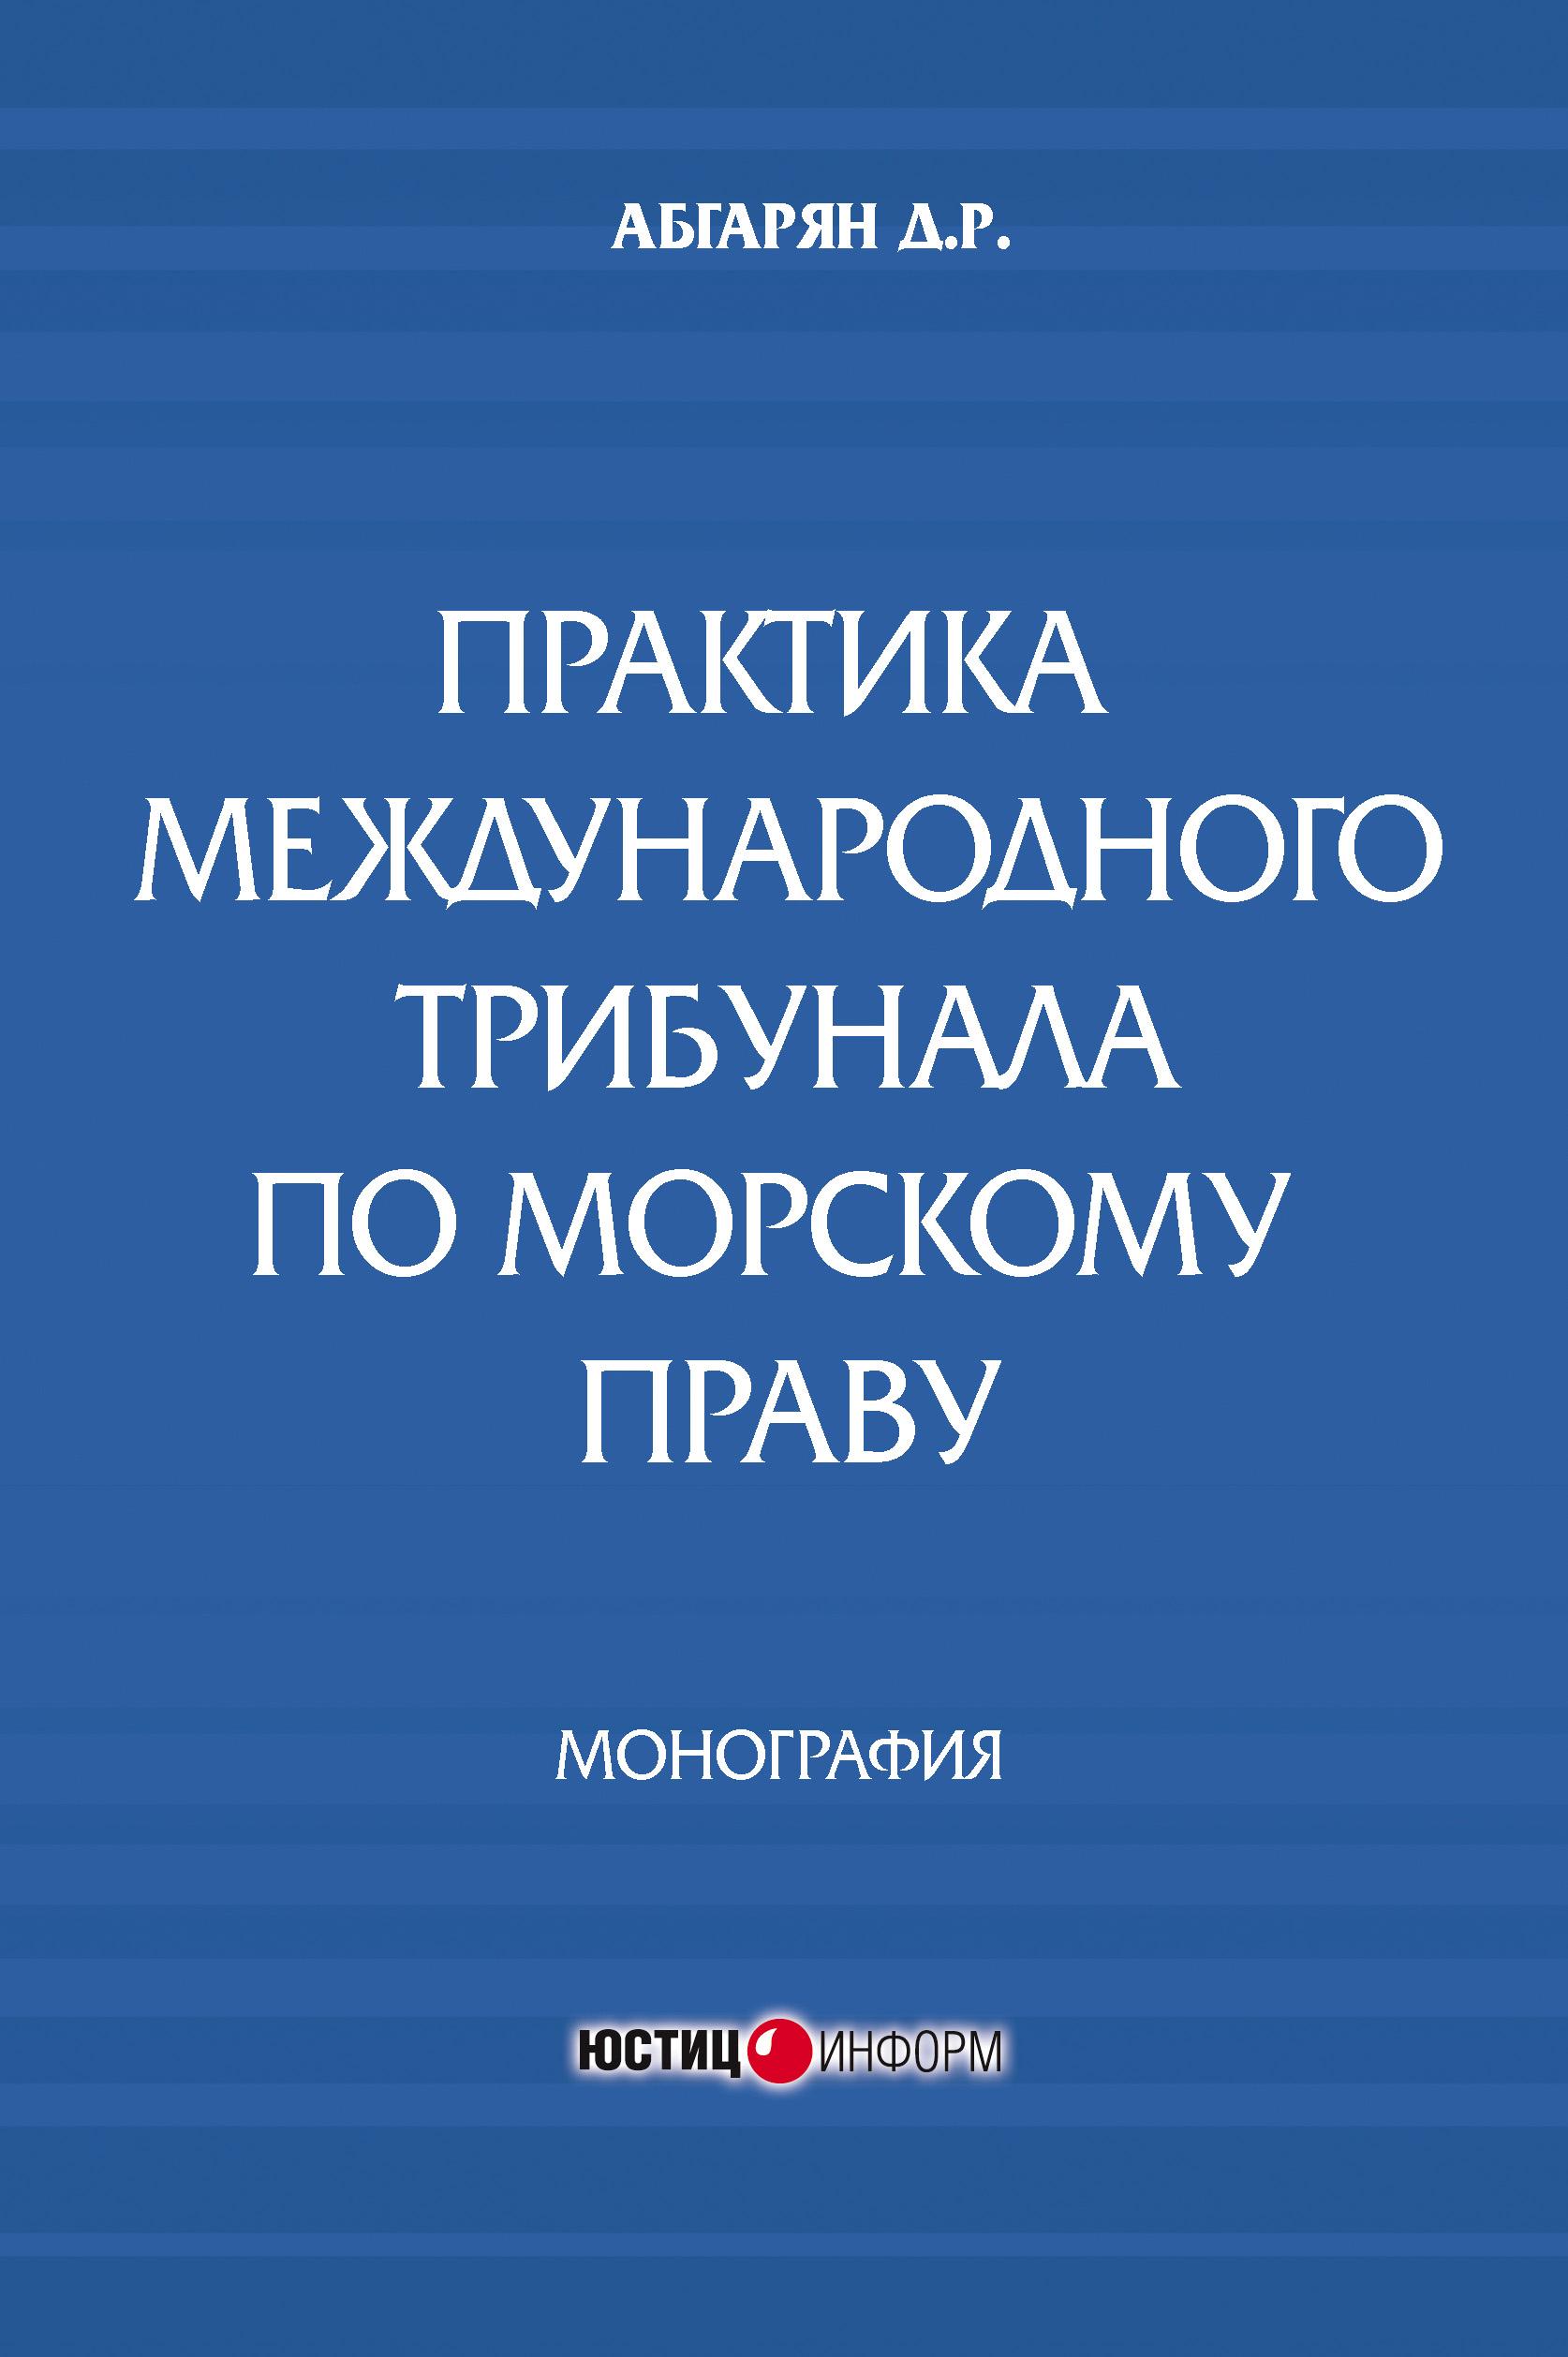 Д. Р. Абгарян Практика международного трибунала по морскому праву competence in the law